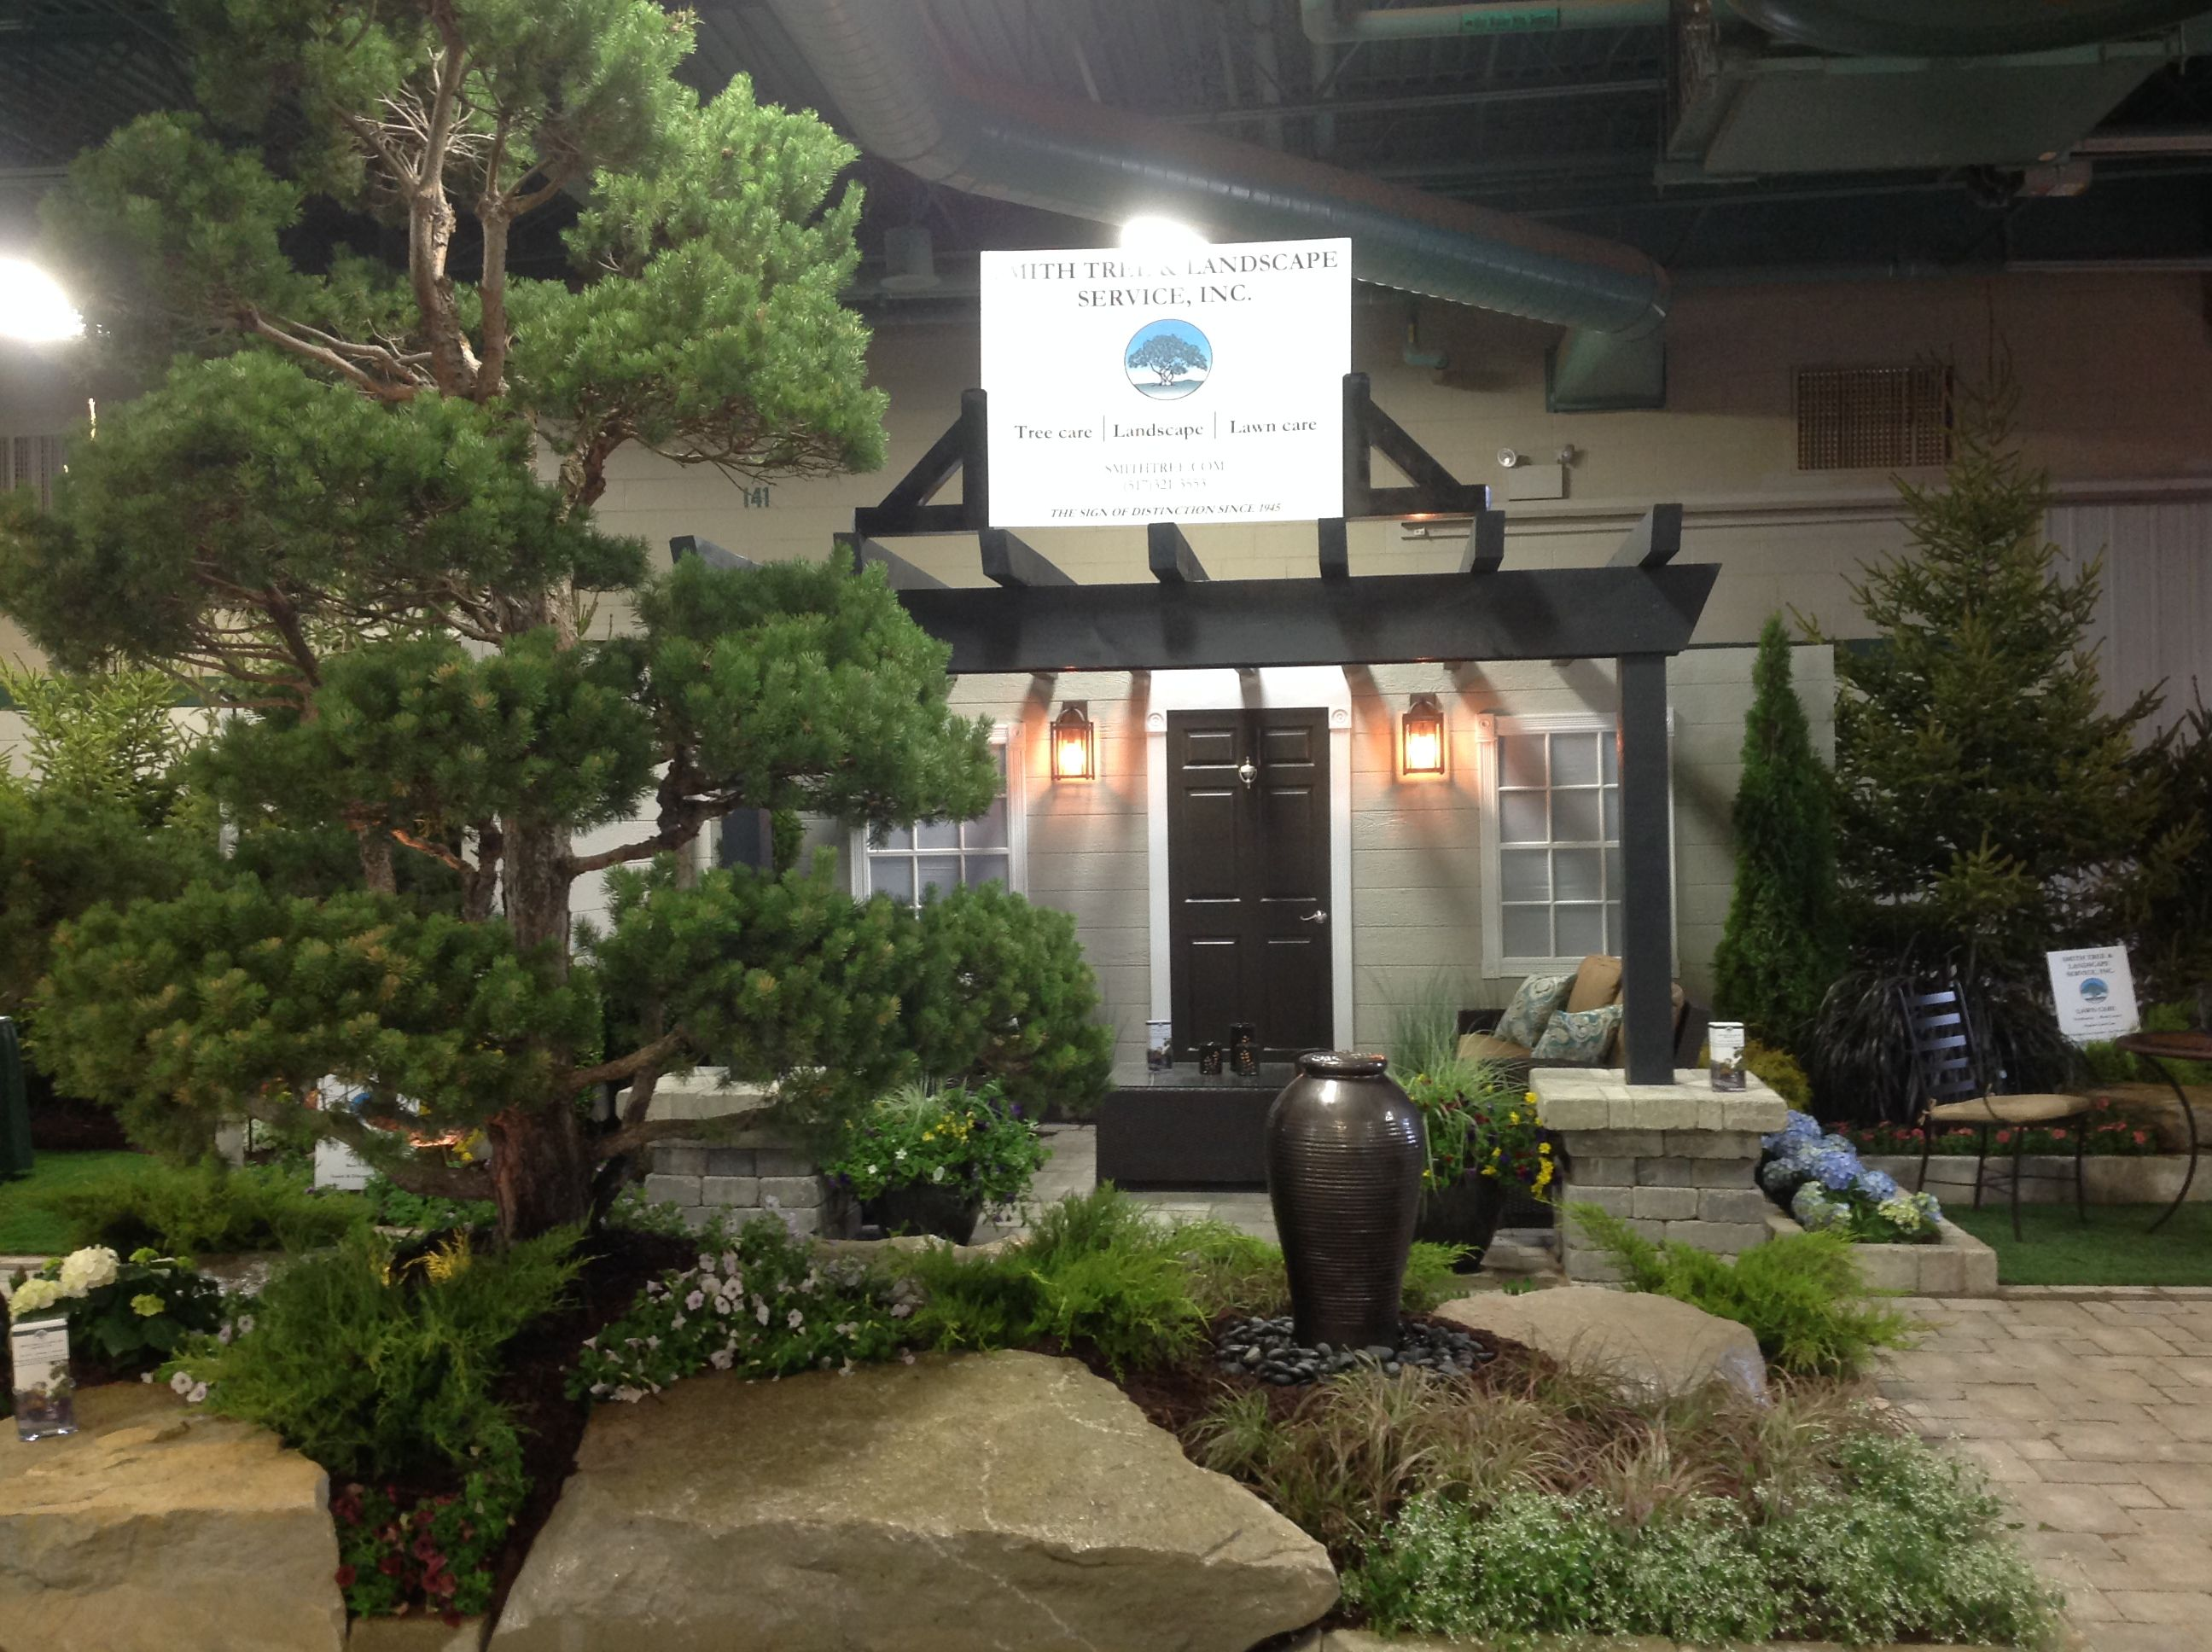 Home And Design Shows 2015 Home And Garden Show Booth Designed By Kim  Boruszewski